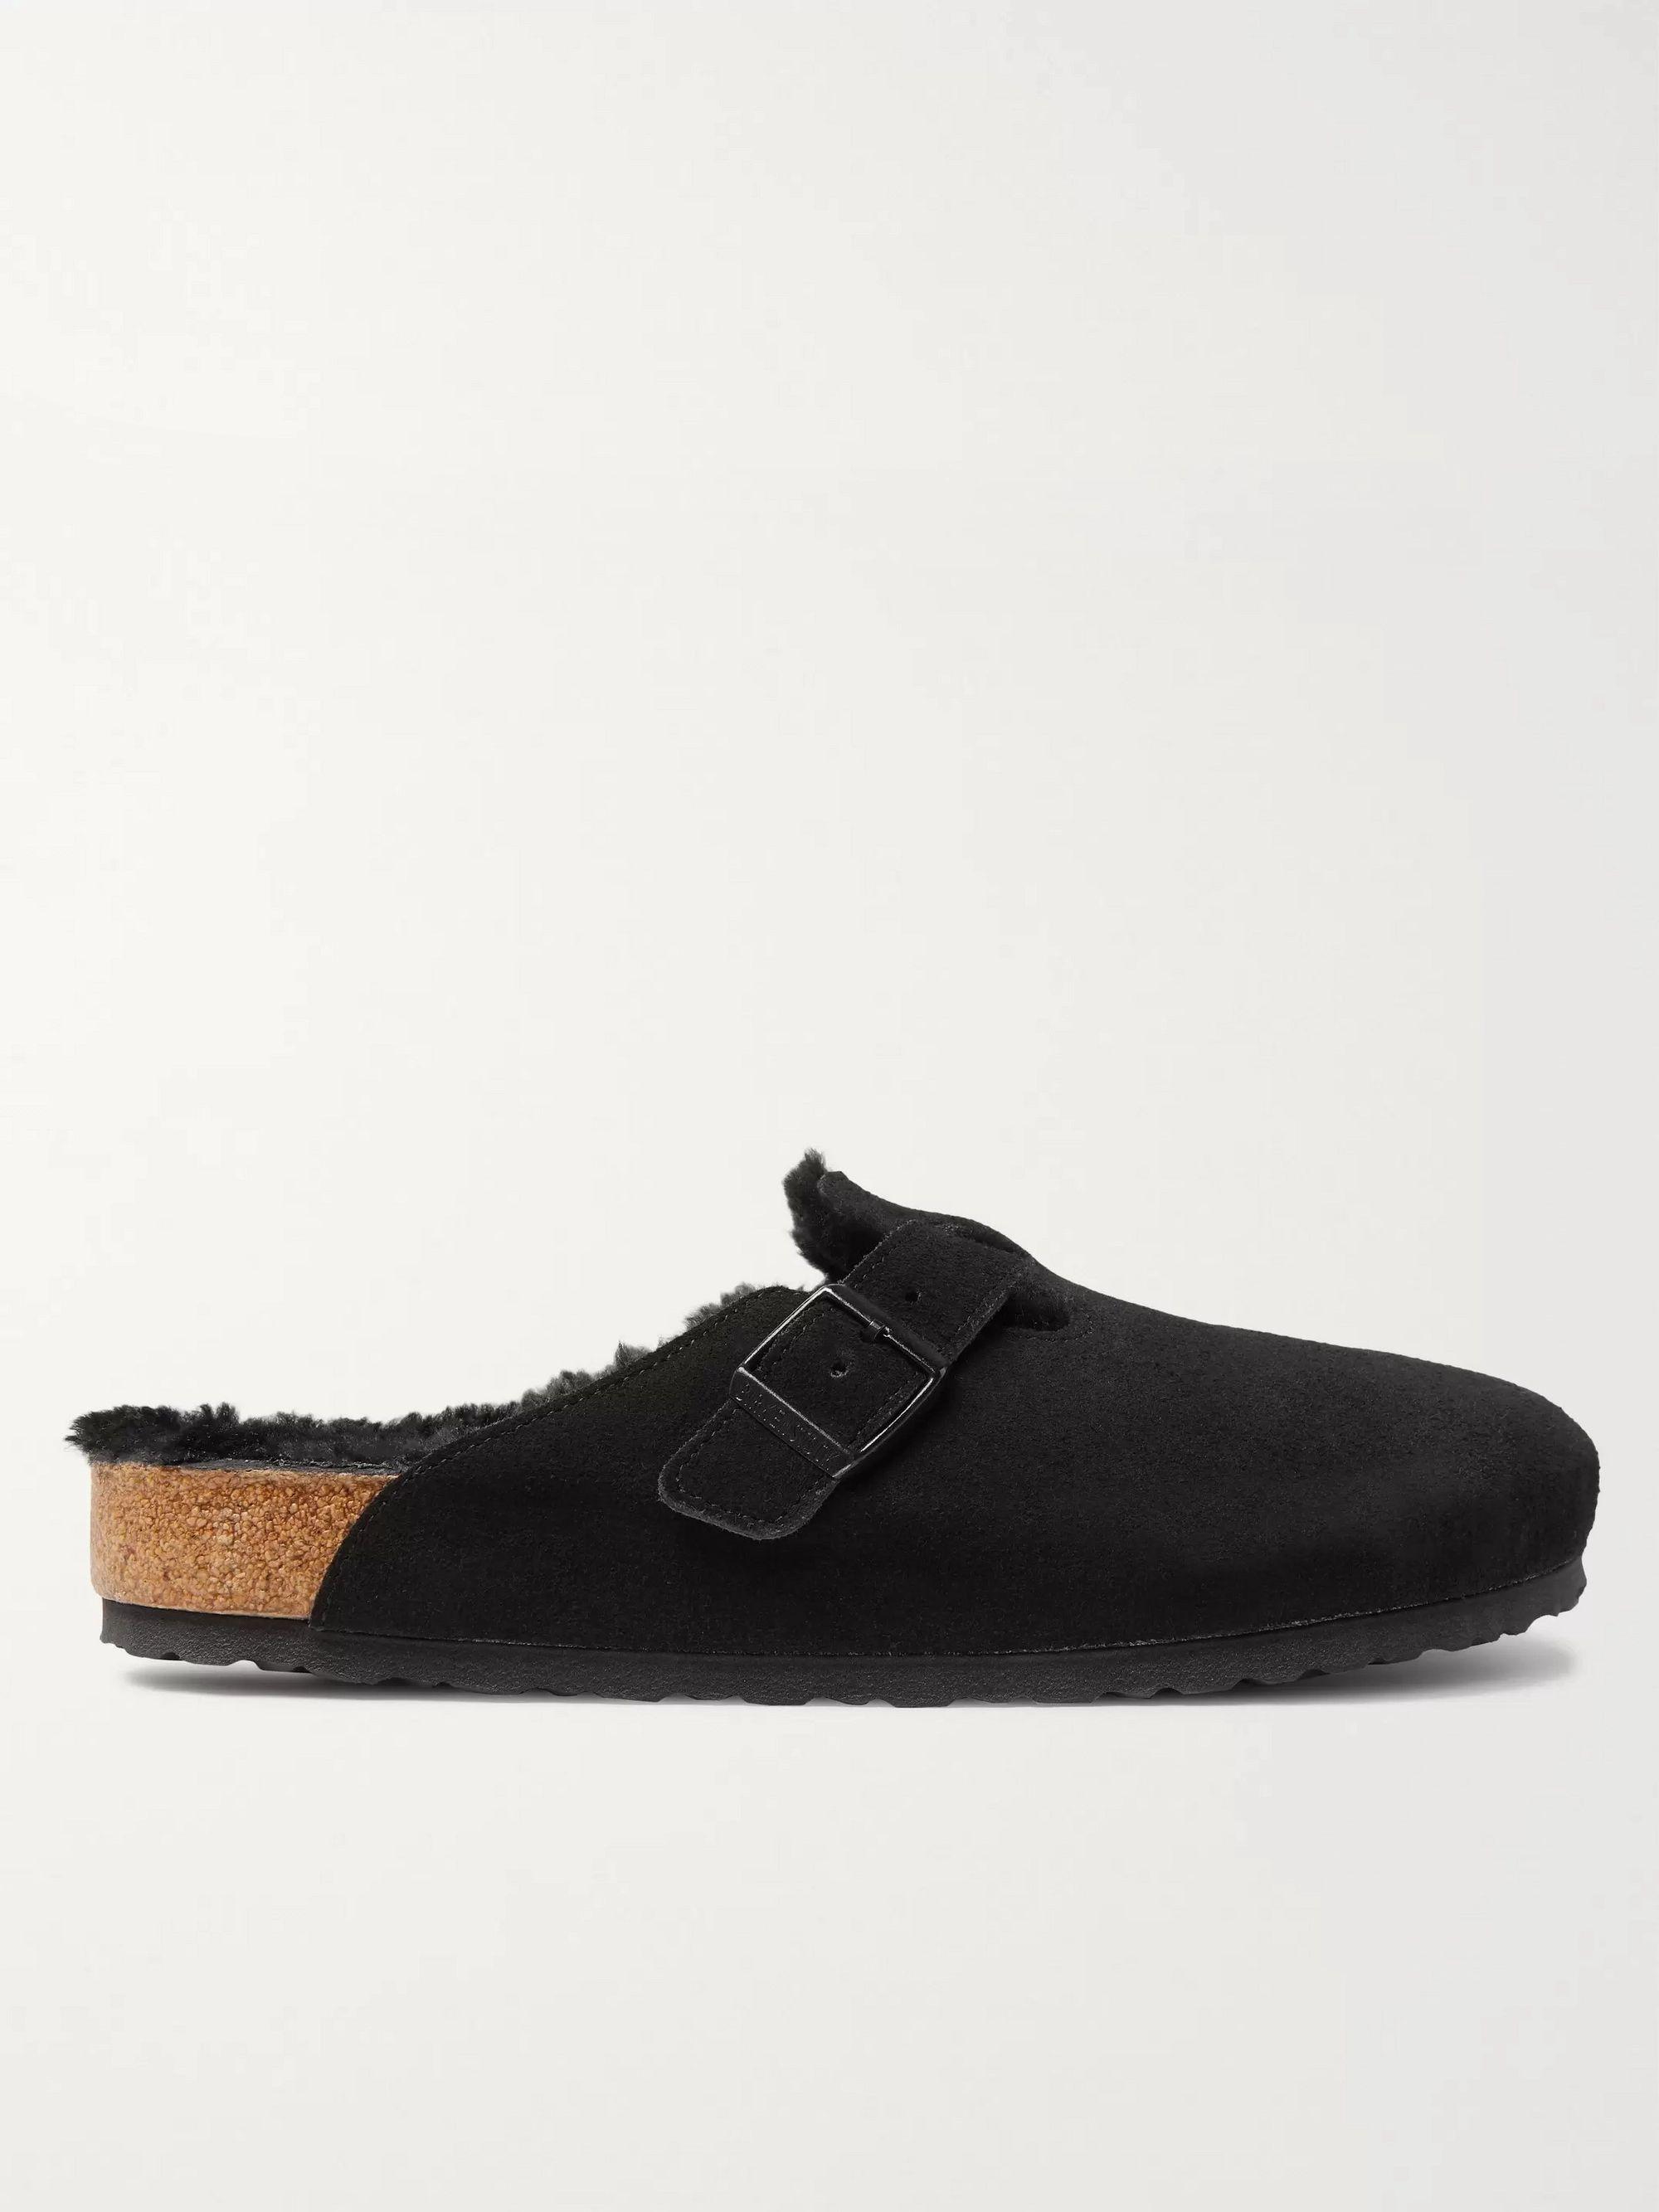 Birkenstock Boston Shearling-Lined Suede Sandals,Black